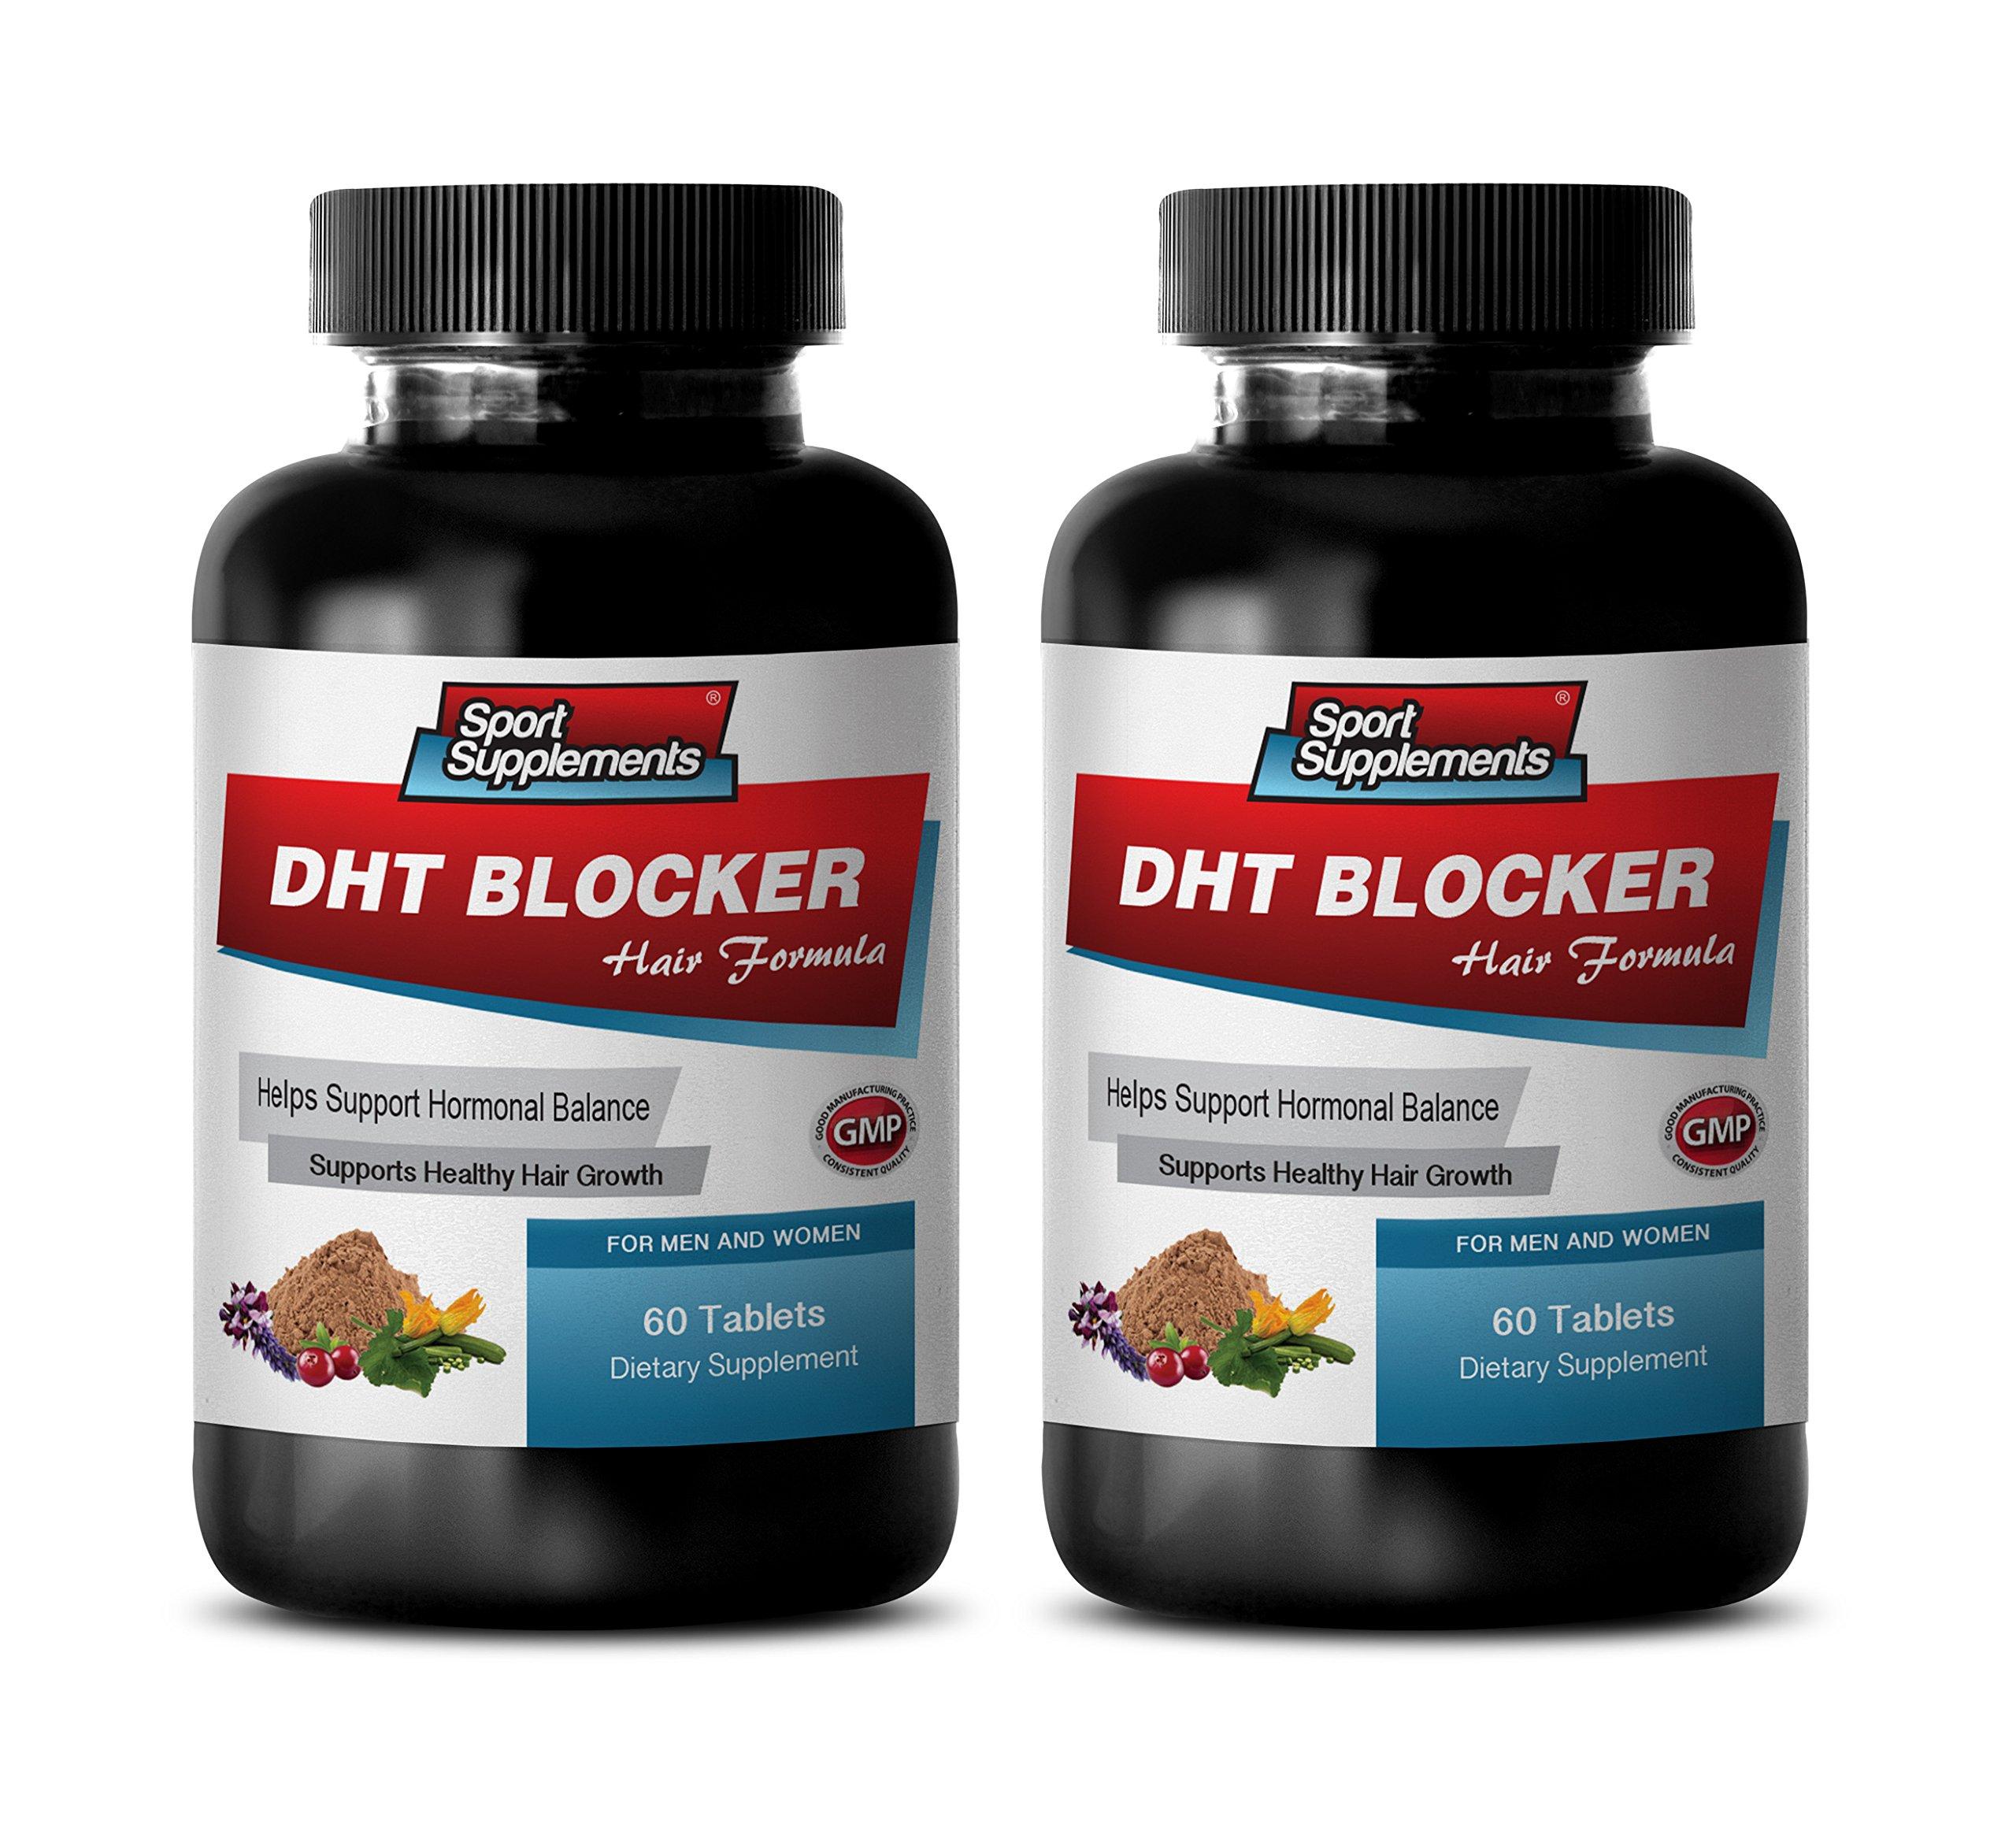 hair growth dht blocker supplement - DHT BLOCKER HAIR FORMULA - SUPPORT HEALTHY HAIR GROWTH - zinc natural supplement - 2 Bottles 120 Coated Tablets